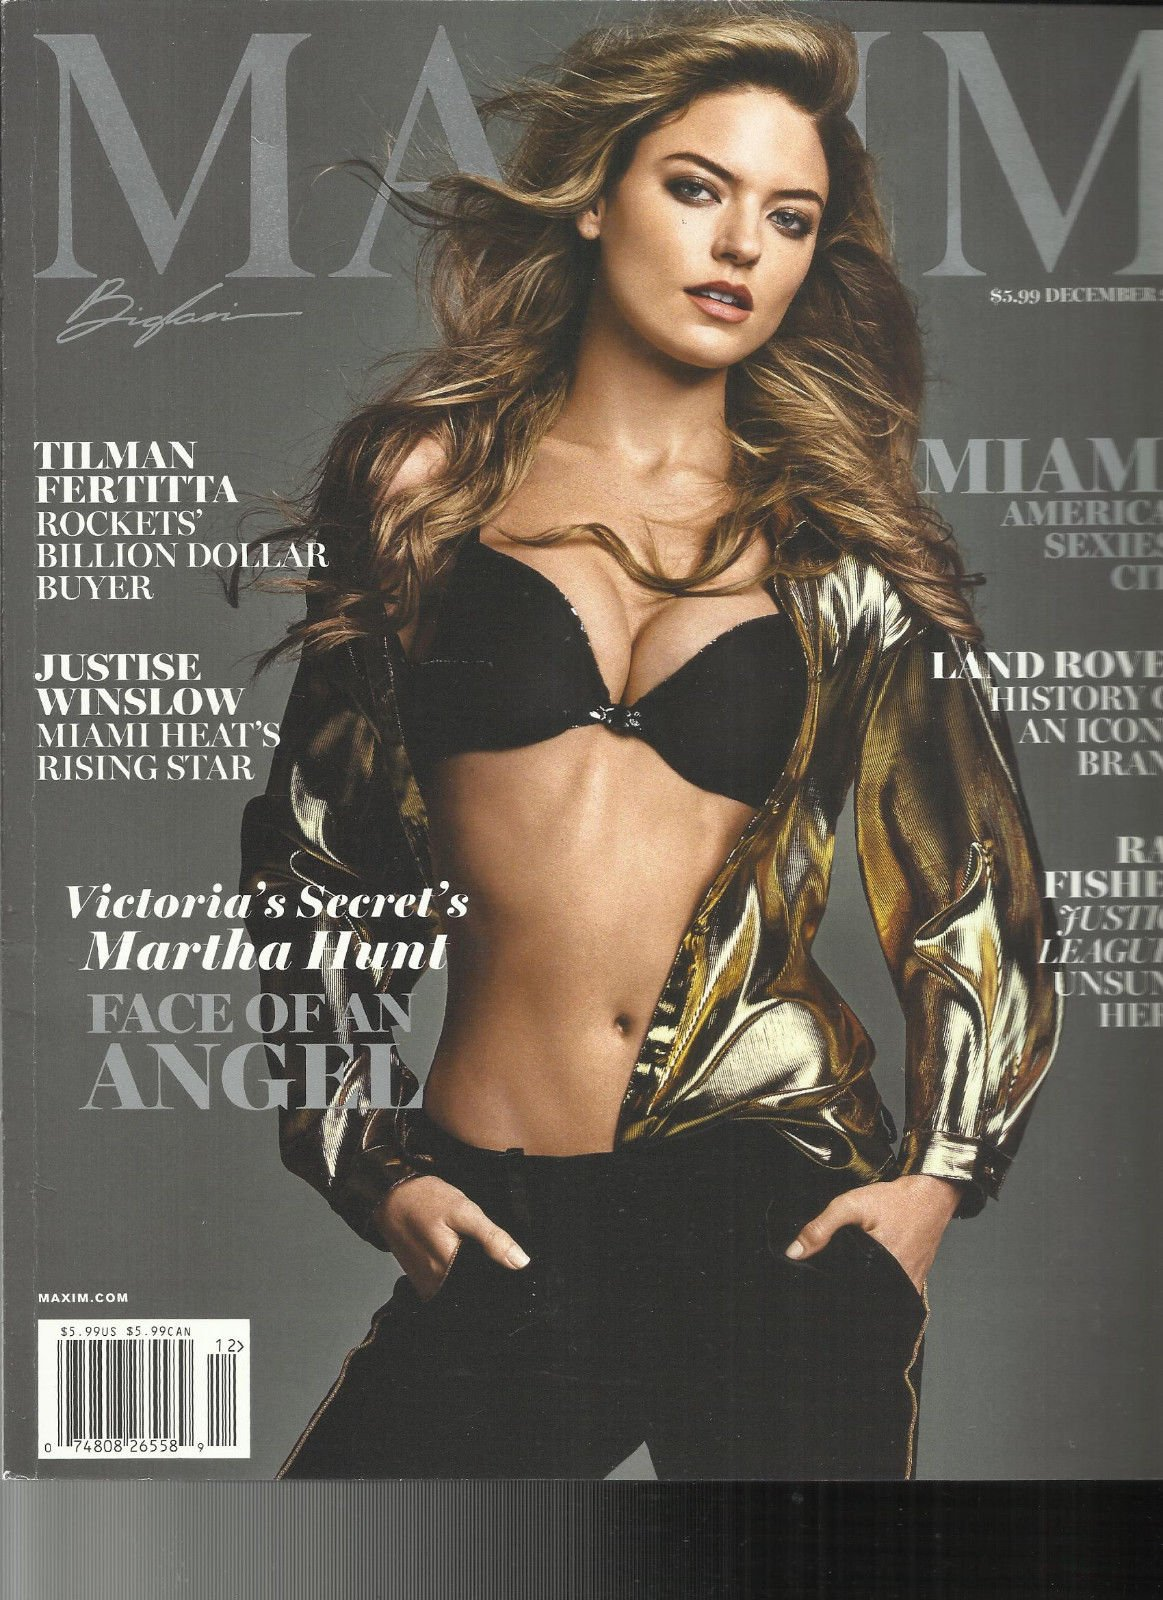 MAXIM MAGAZINE, MIAMI AMERICA'S SEXIEST CITY DECEMBER, 2017 NO. 229